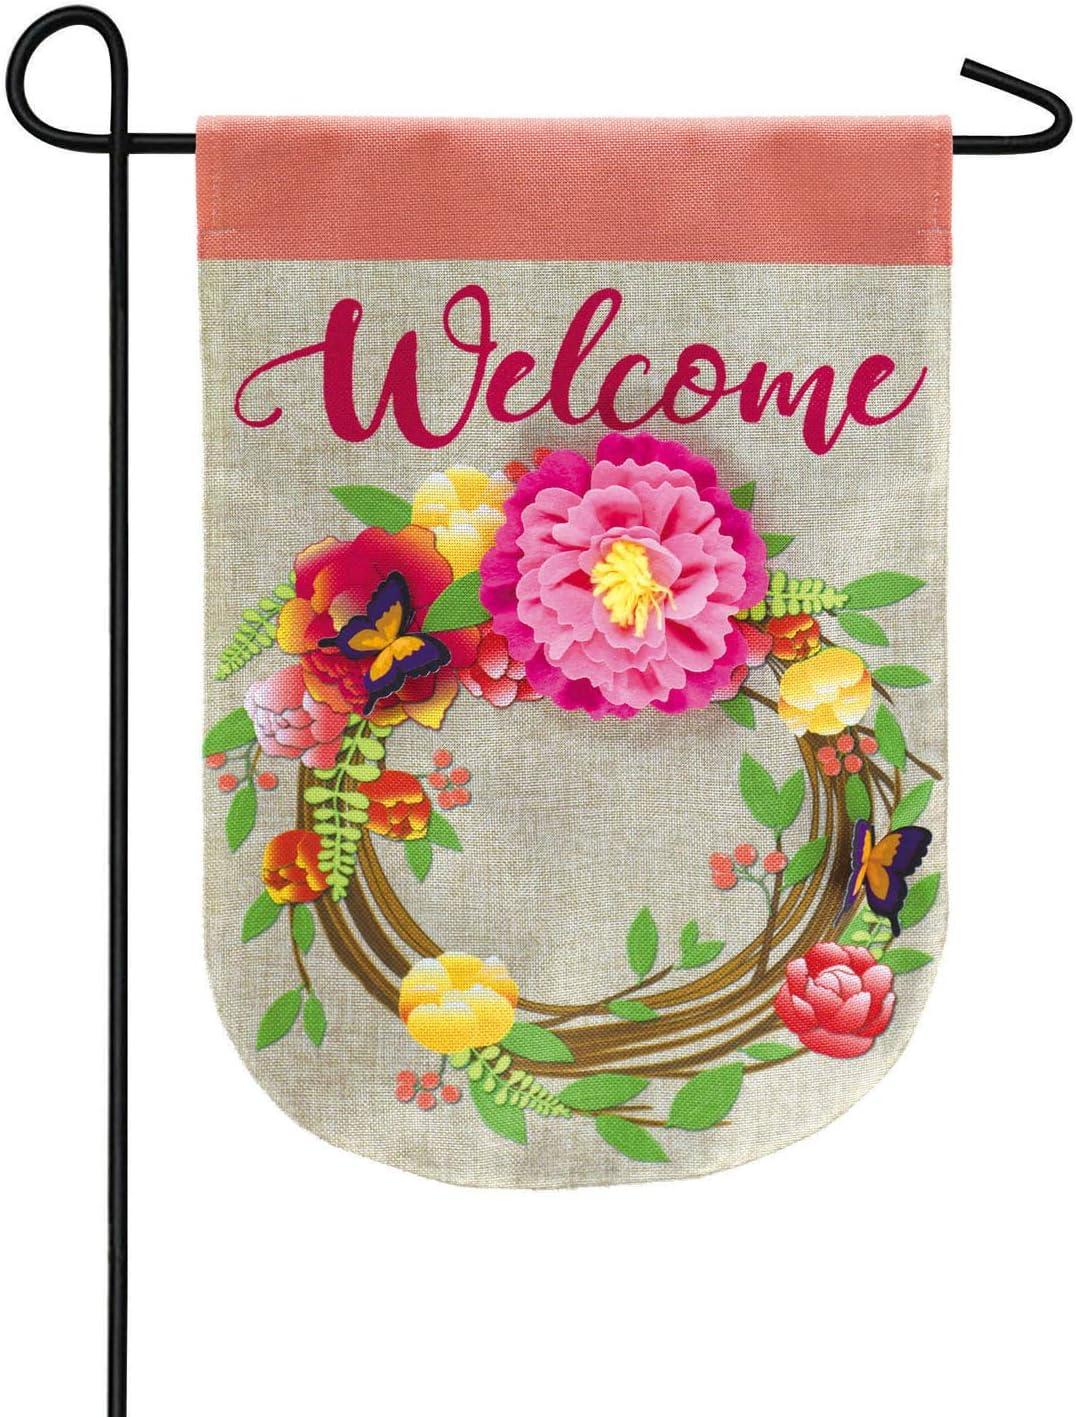 Floral Wreath Garden Burlap Flag - 13 x 1 x 18 Inches